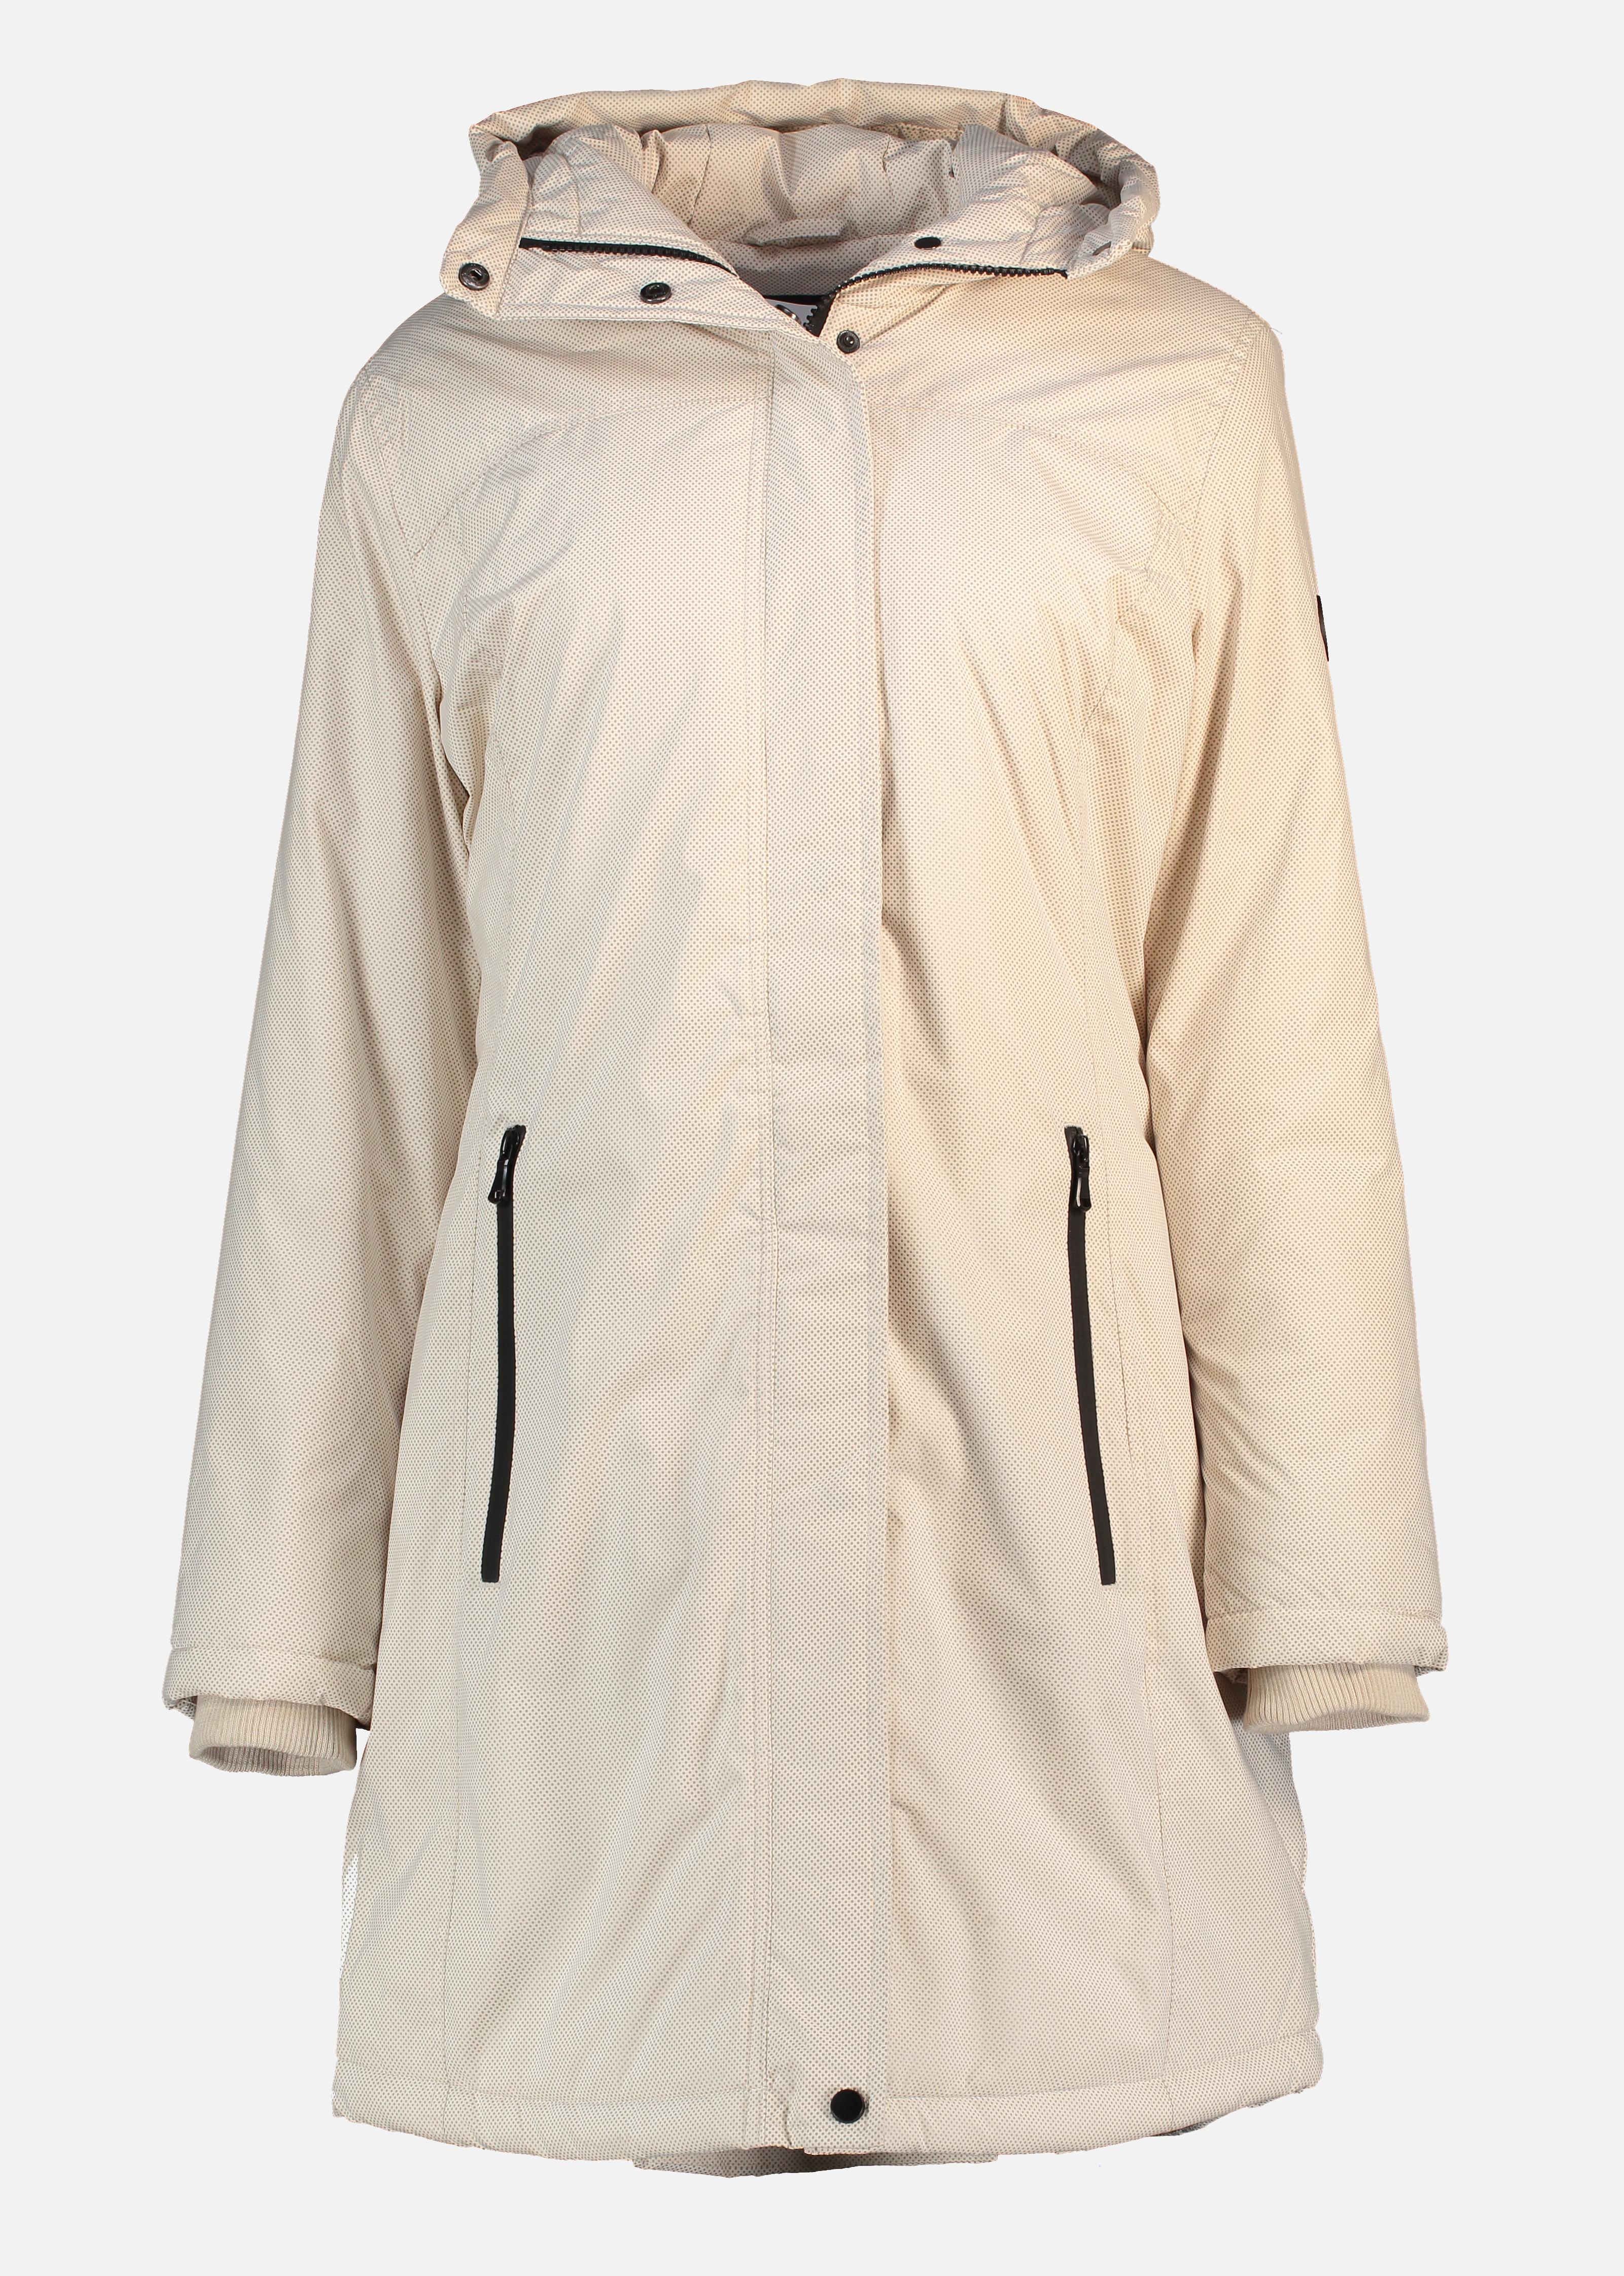 Lea Jacket Navy Zfashion.no